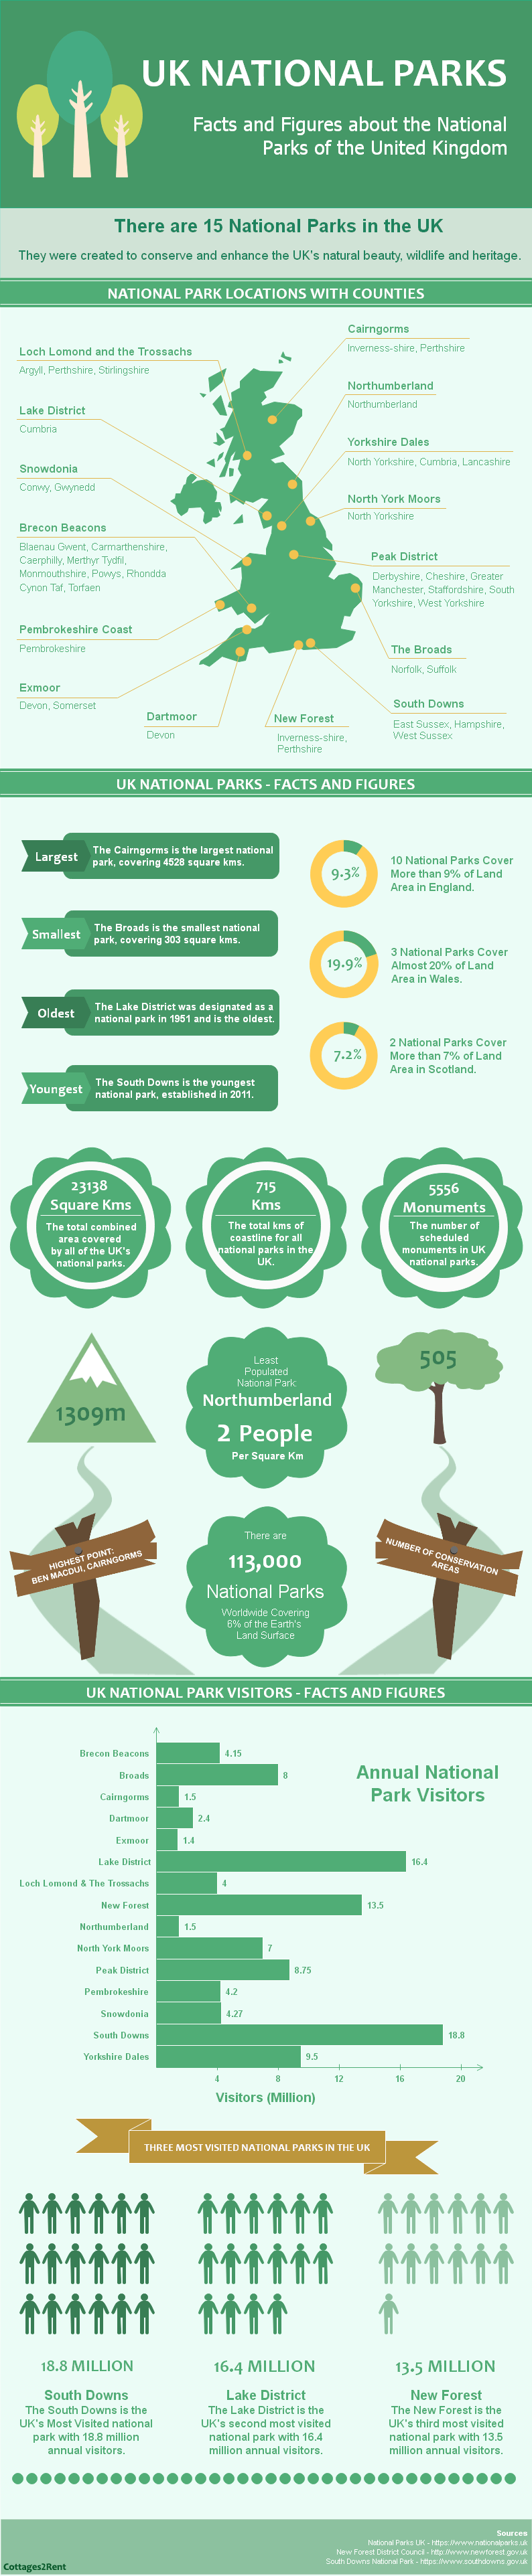 UK National Parks: Facts & Figures